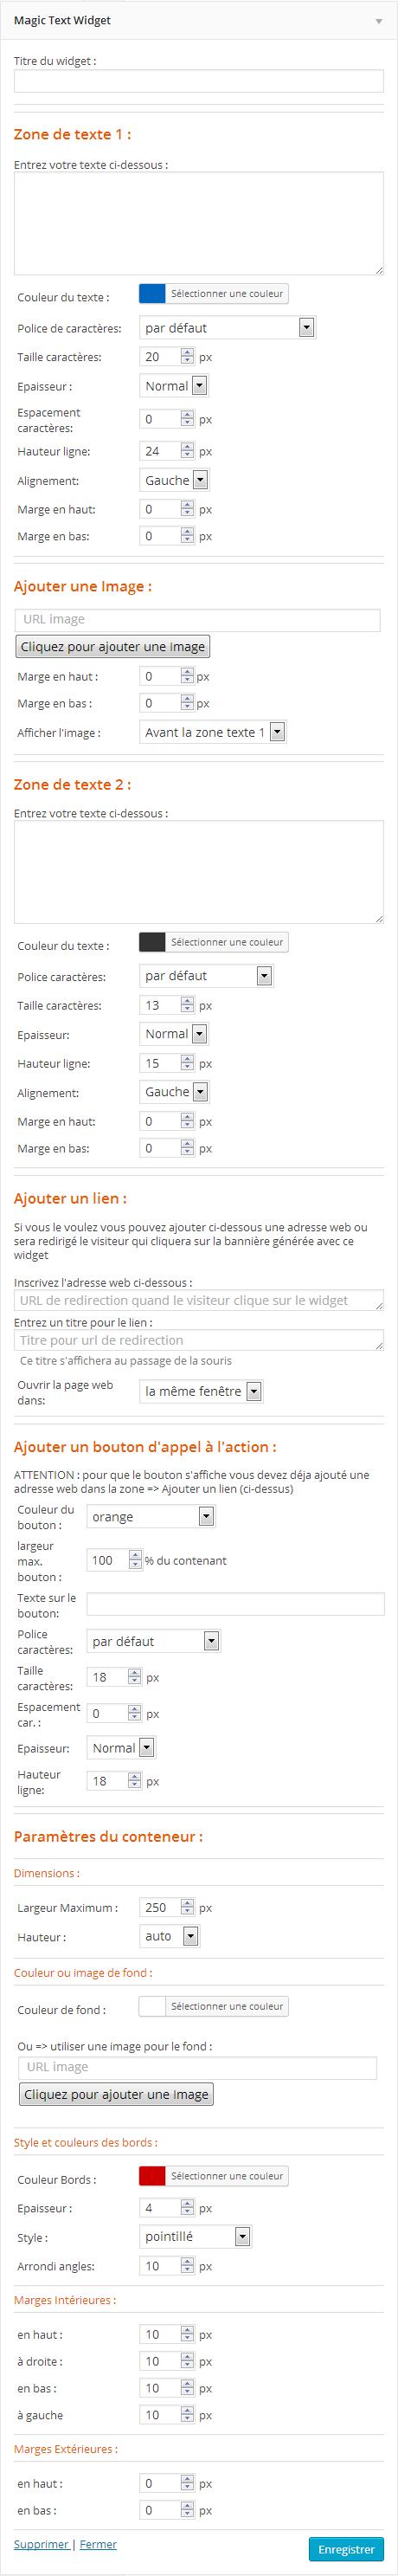 Widget magic-text-widget